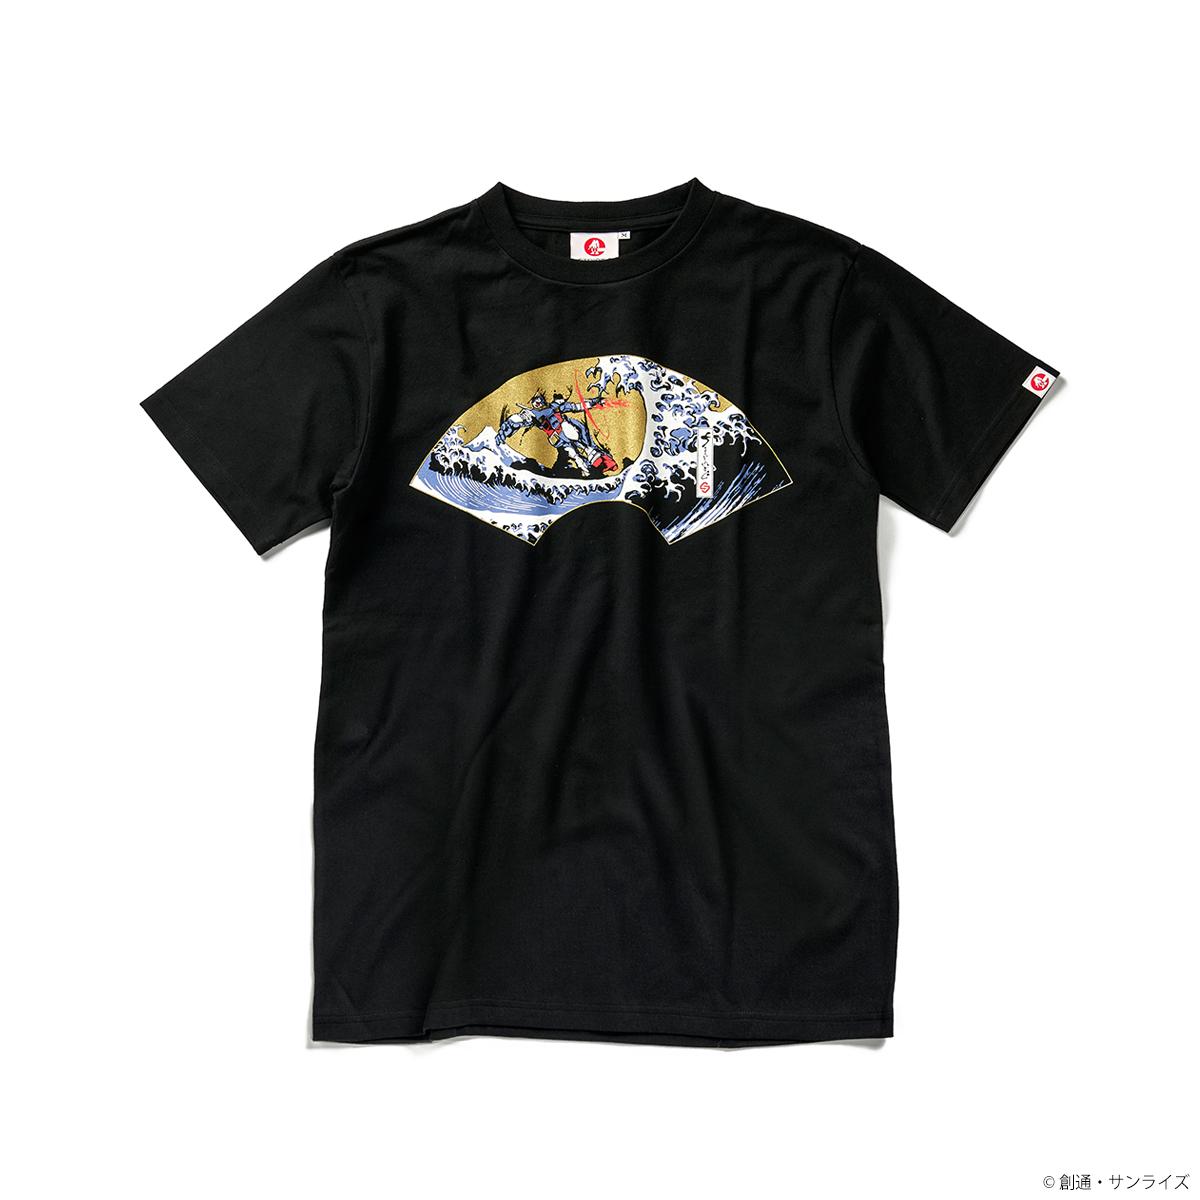 STRICT-G JAPAN 『機動戦士ガンダム』 Tシャツ 浪裏ガンダム扇柄